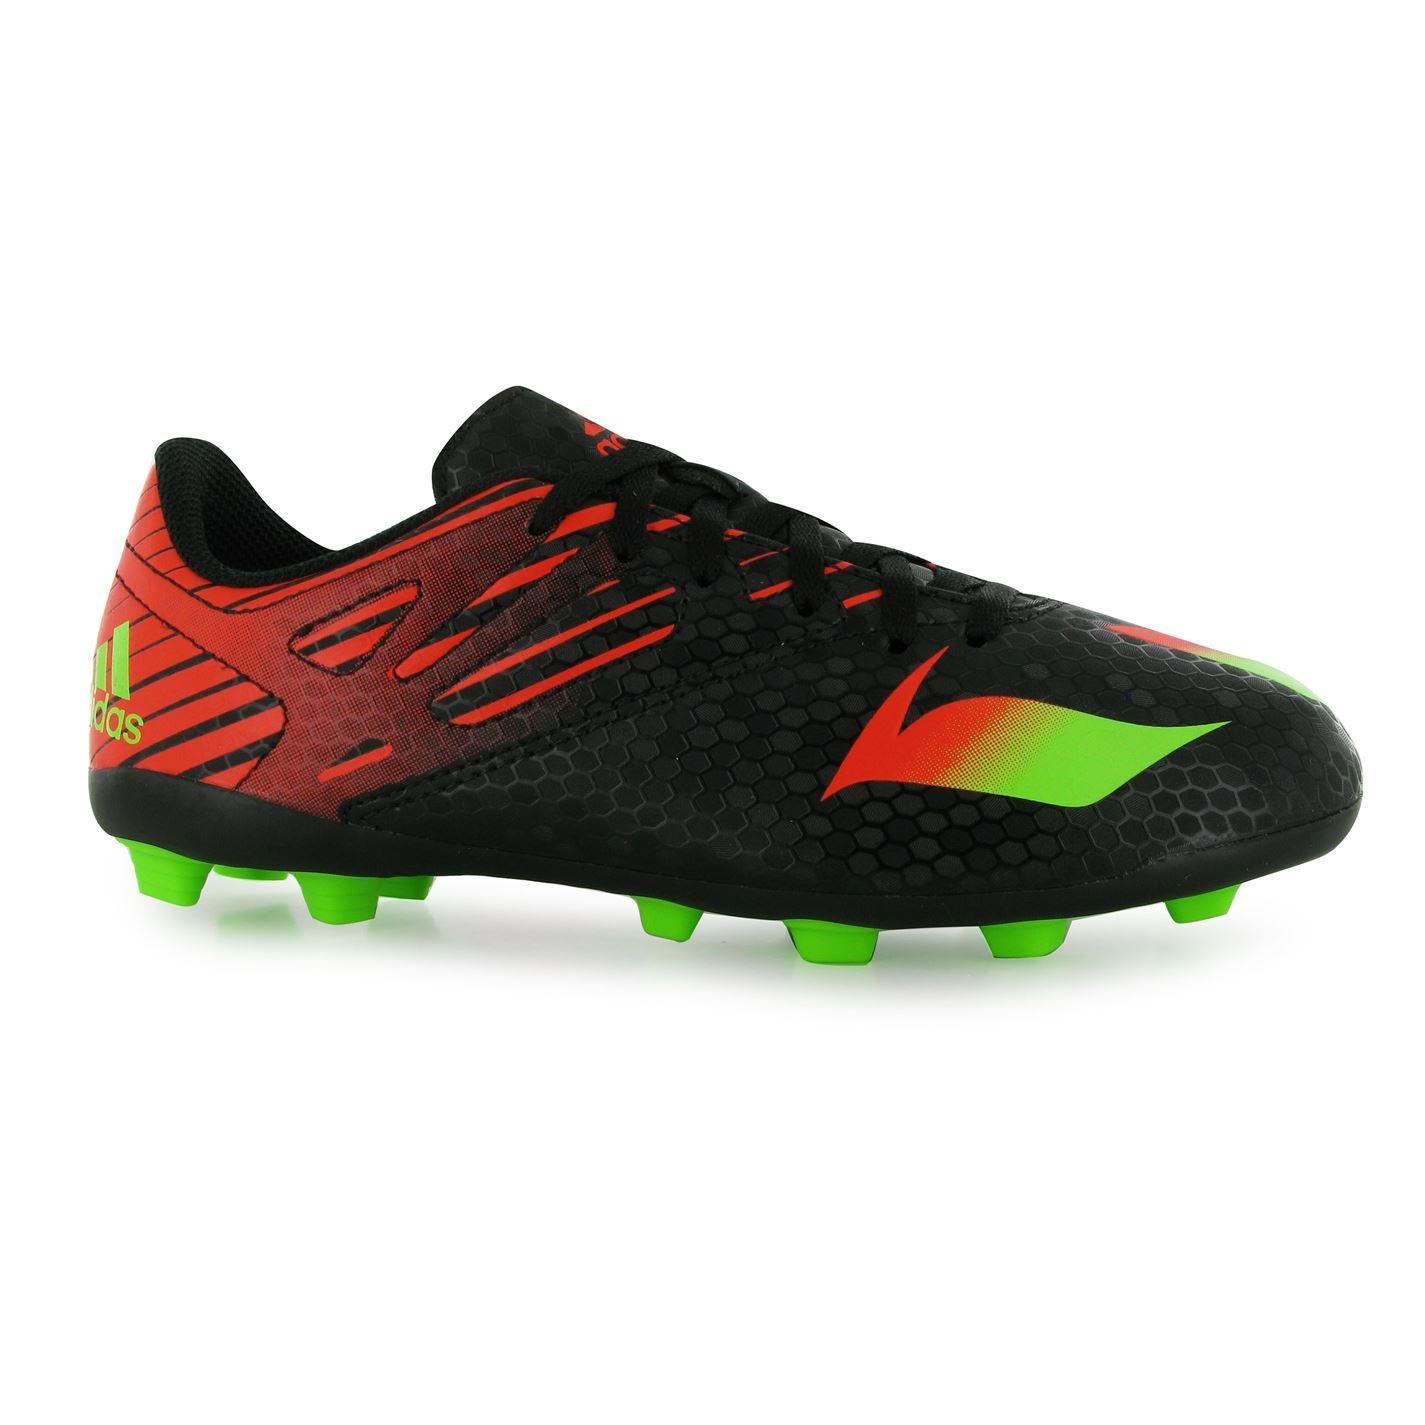 Kids Shoe Football Studs